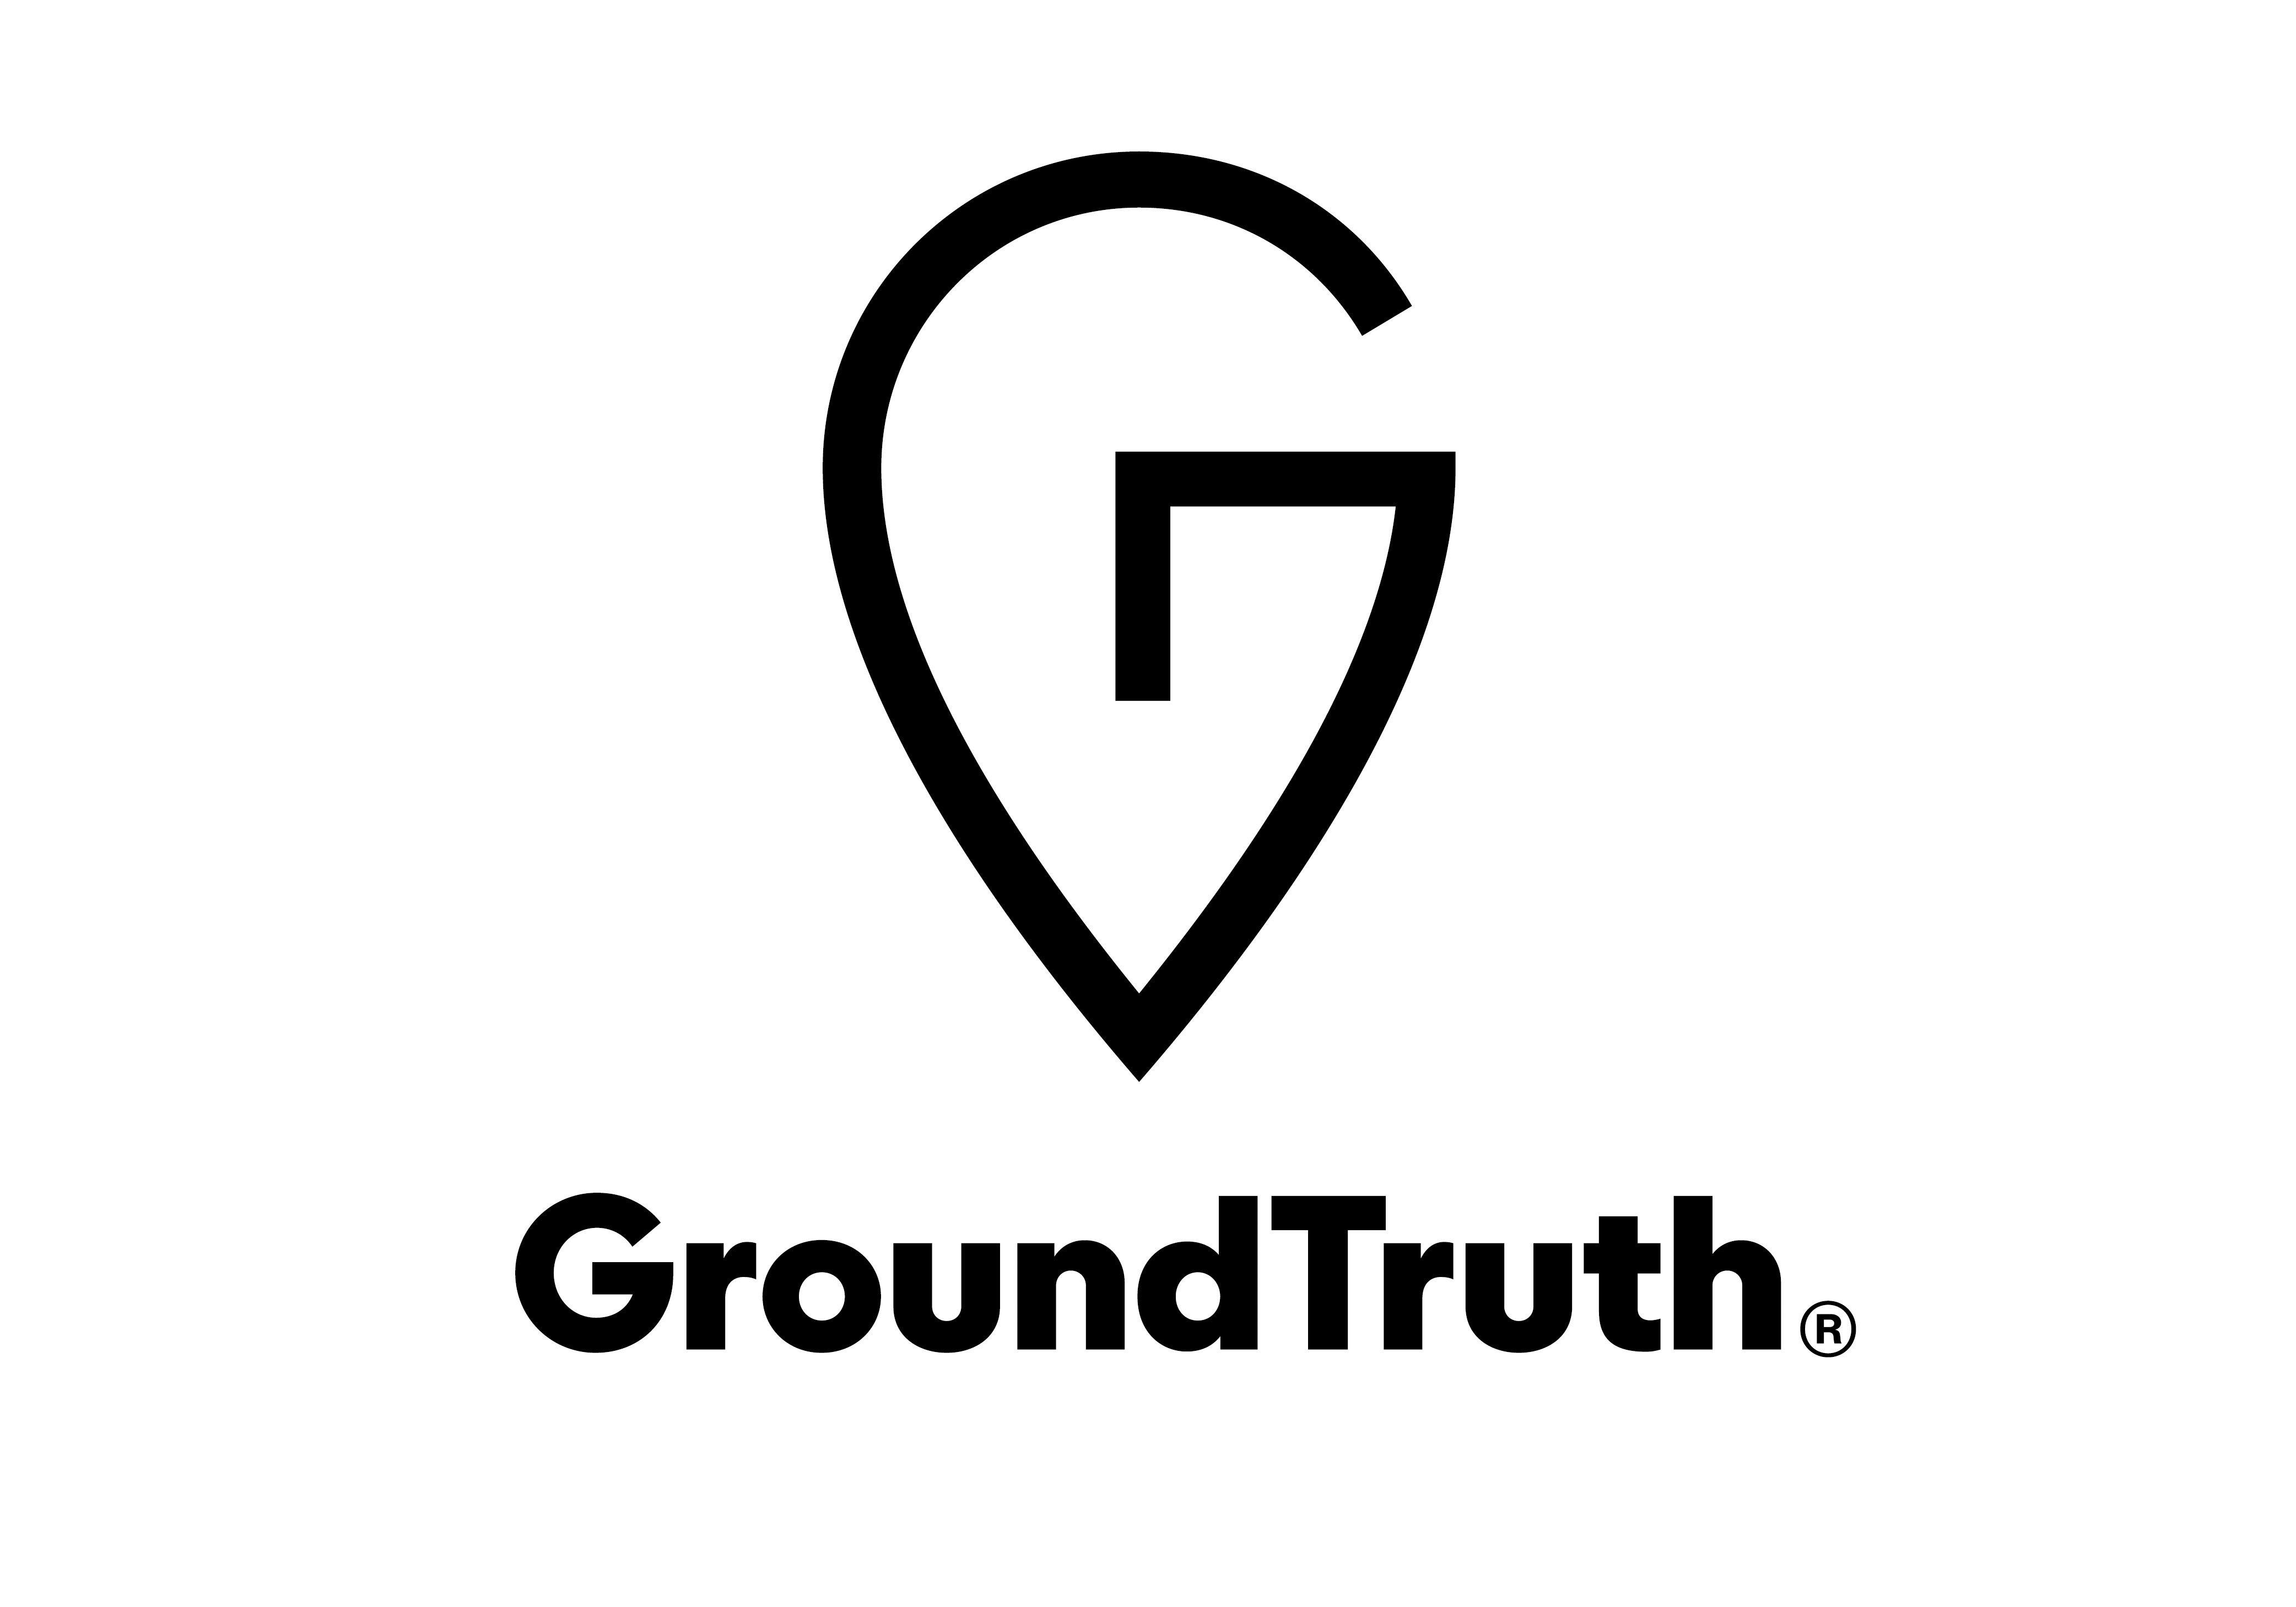 GroundTruthLogo